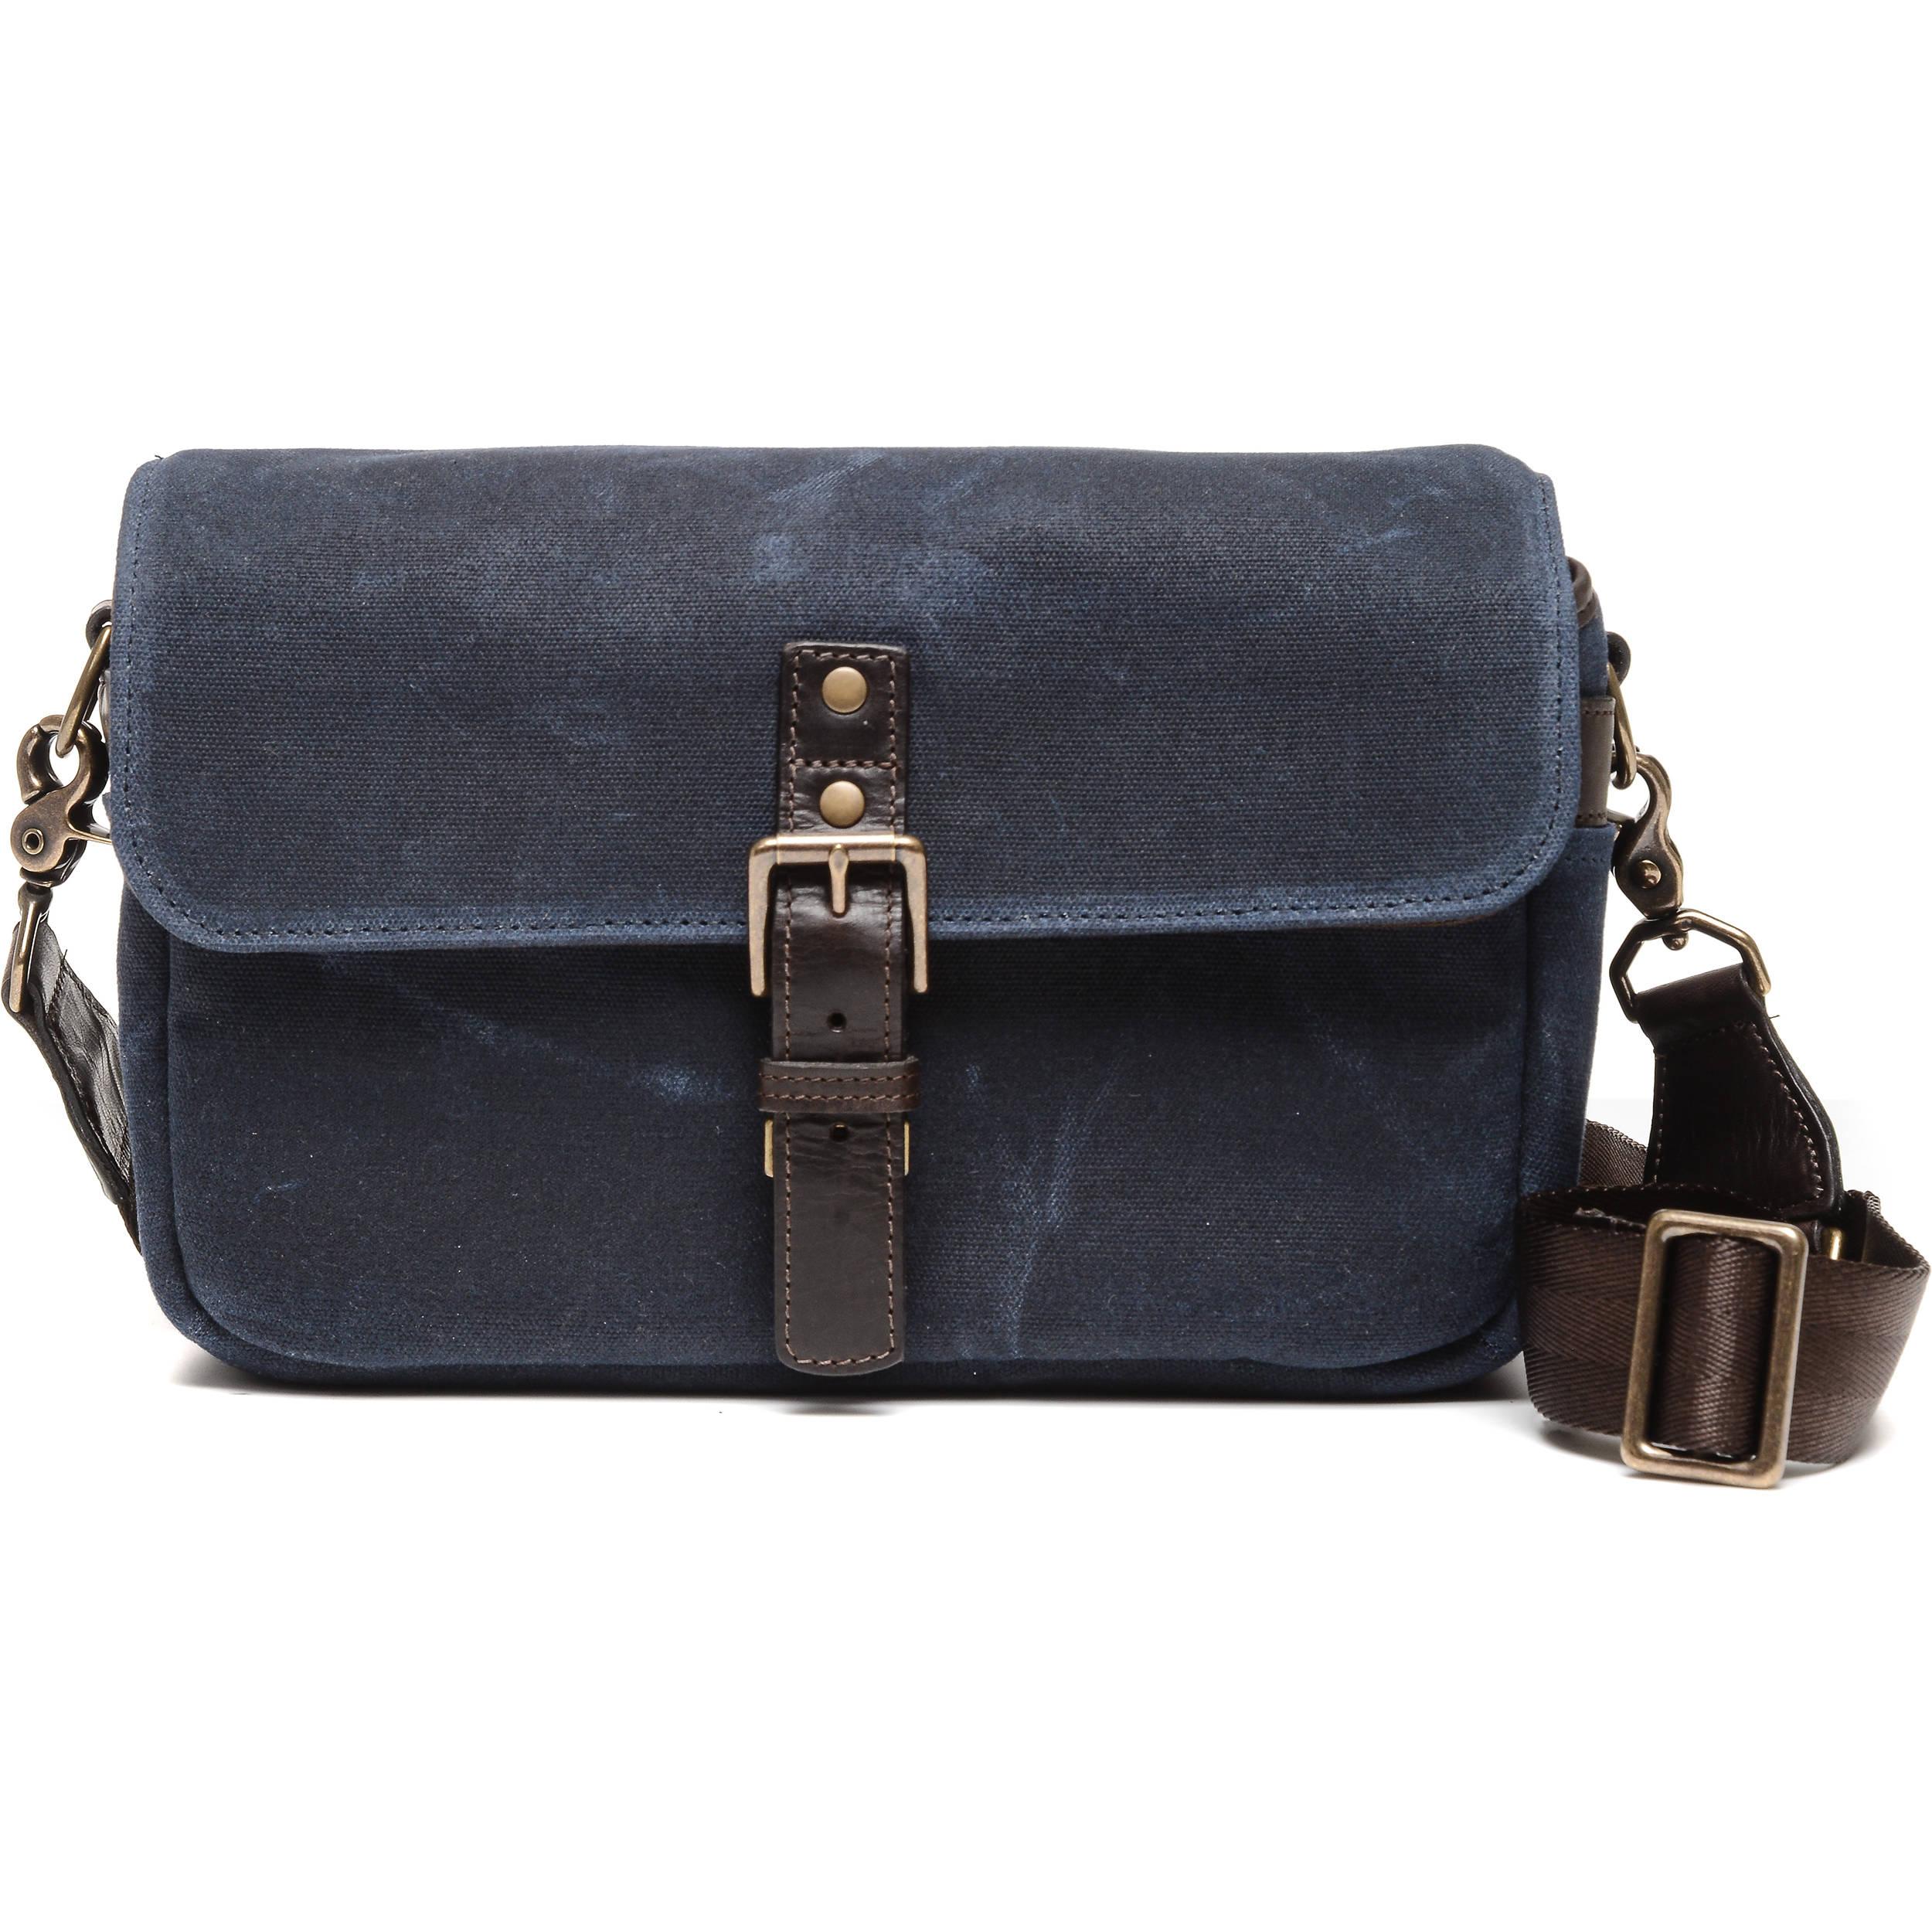 Ona Bowery Camera Bag Canvas Oxford Blue